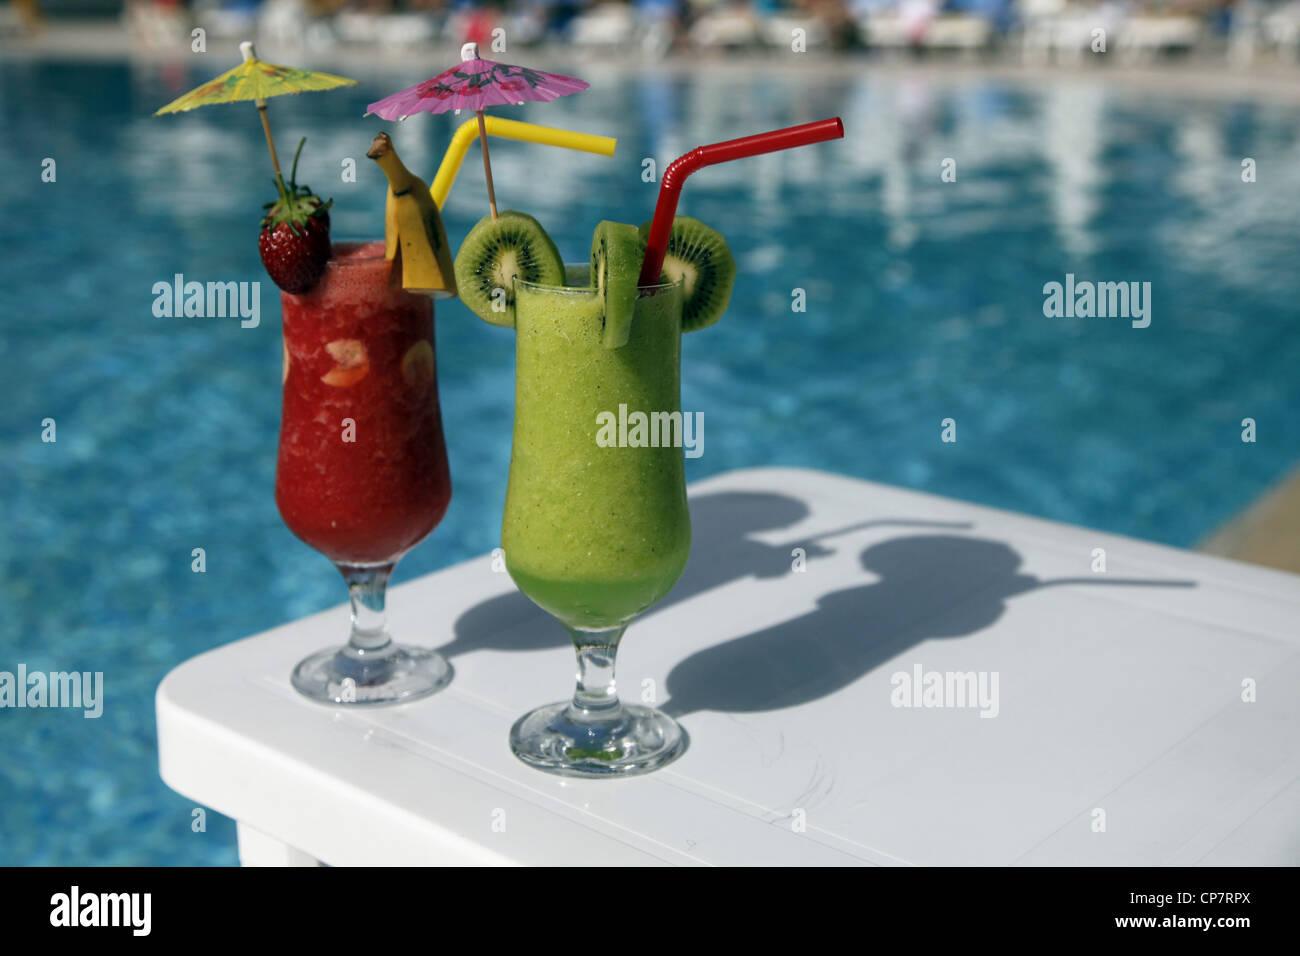 STRAWBERRY & KIWI FRUIT JUICE DRINK SIDE TURKEY 15 April 2012 - Stock Image